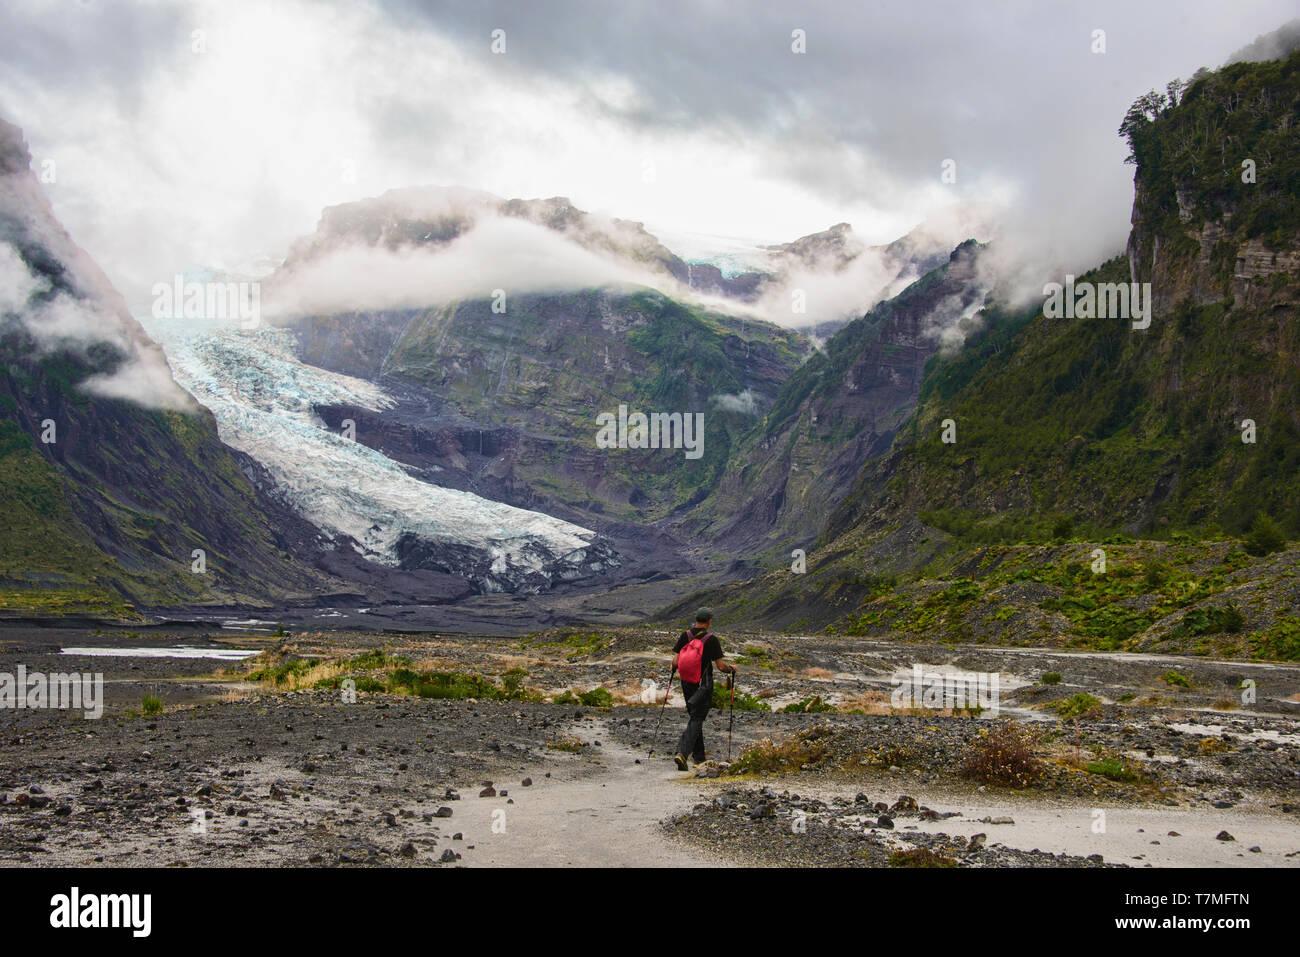 Trekking into Pumalin National Park, Patagonia, Region de los Lagos, Chile - Stock Image